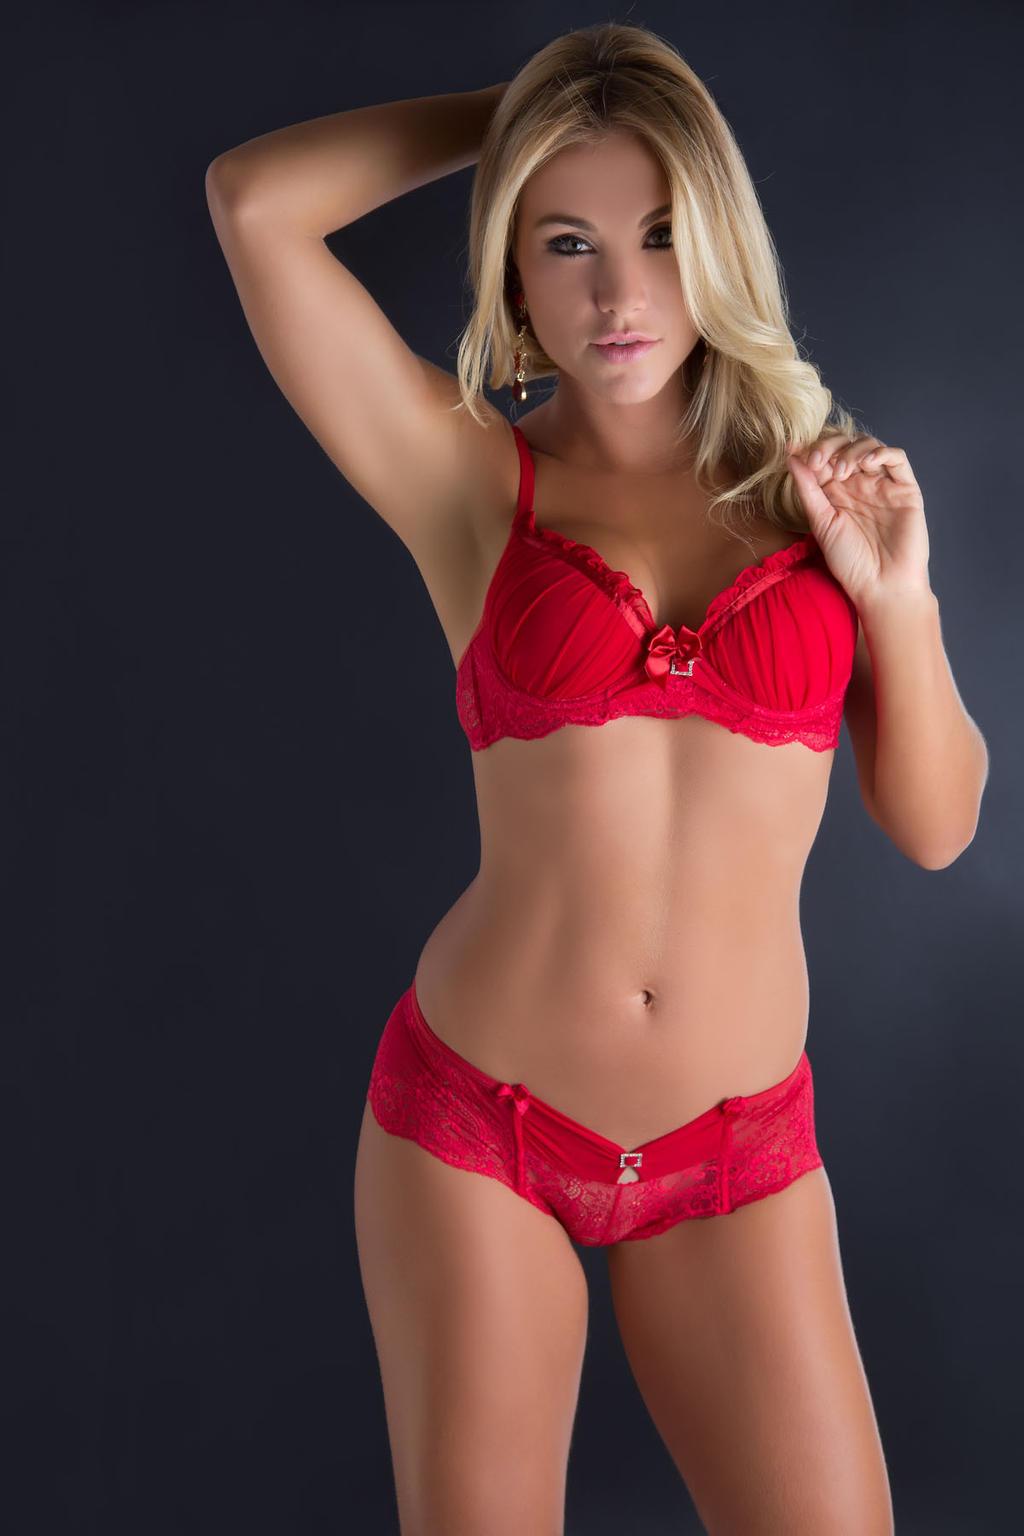 lingerie models of Pics